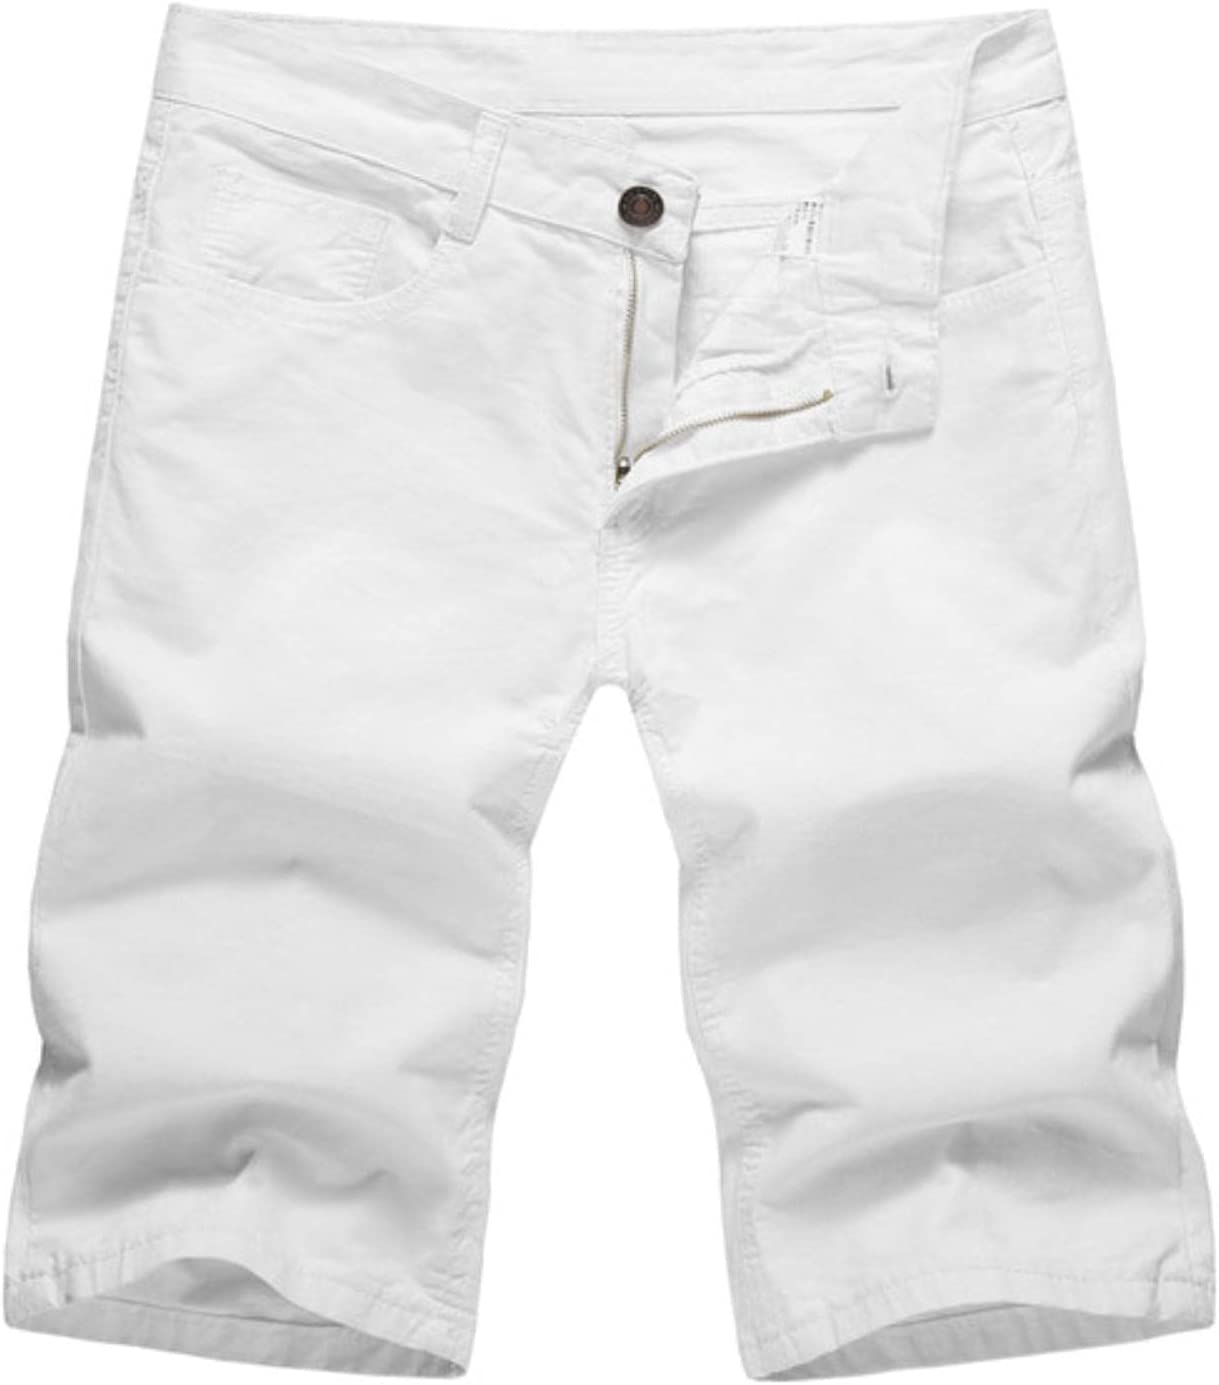 WoJogom 2021 Summer Men Denim Shorts Slim Casual Knee Length Short Hole Jeans Shorts for Men Bermuda